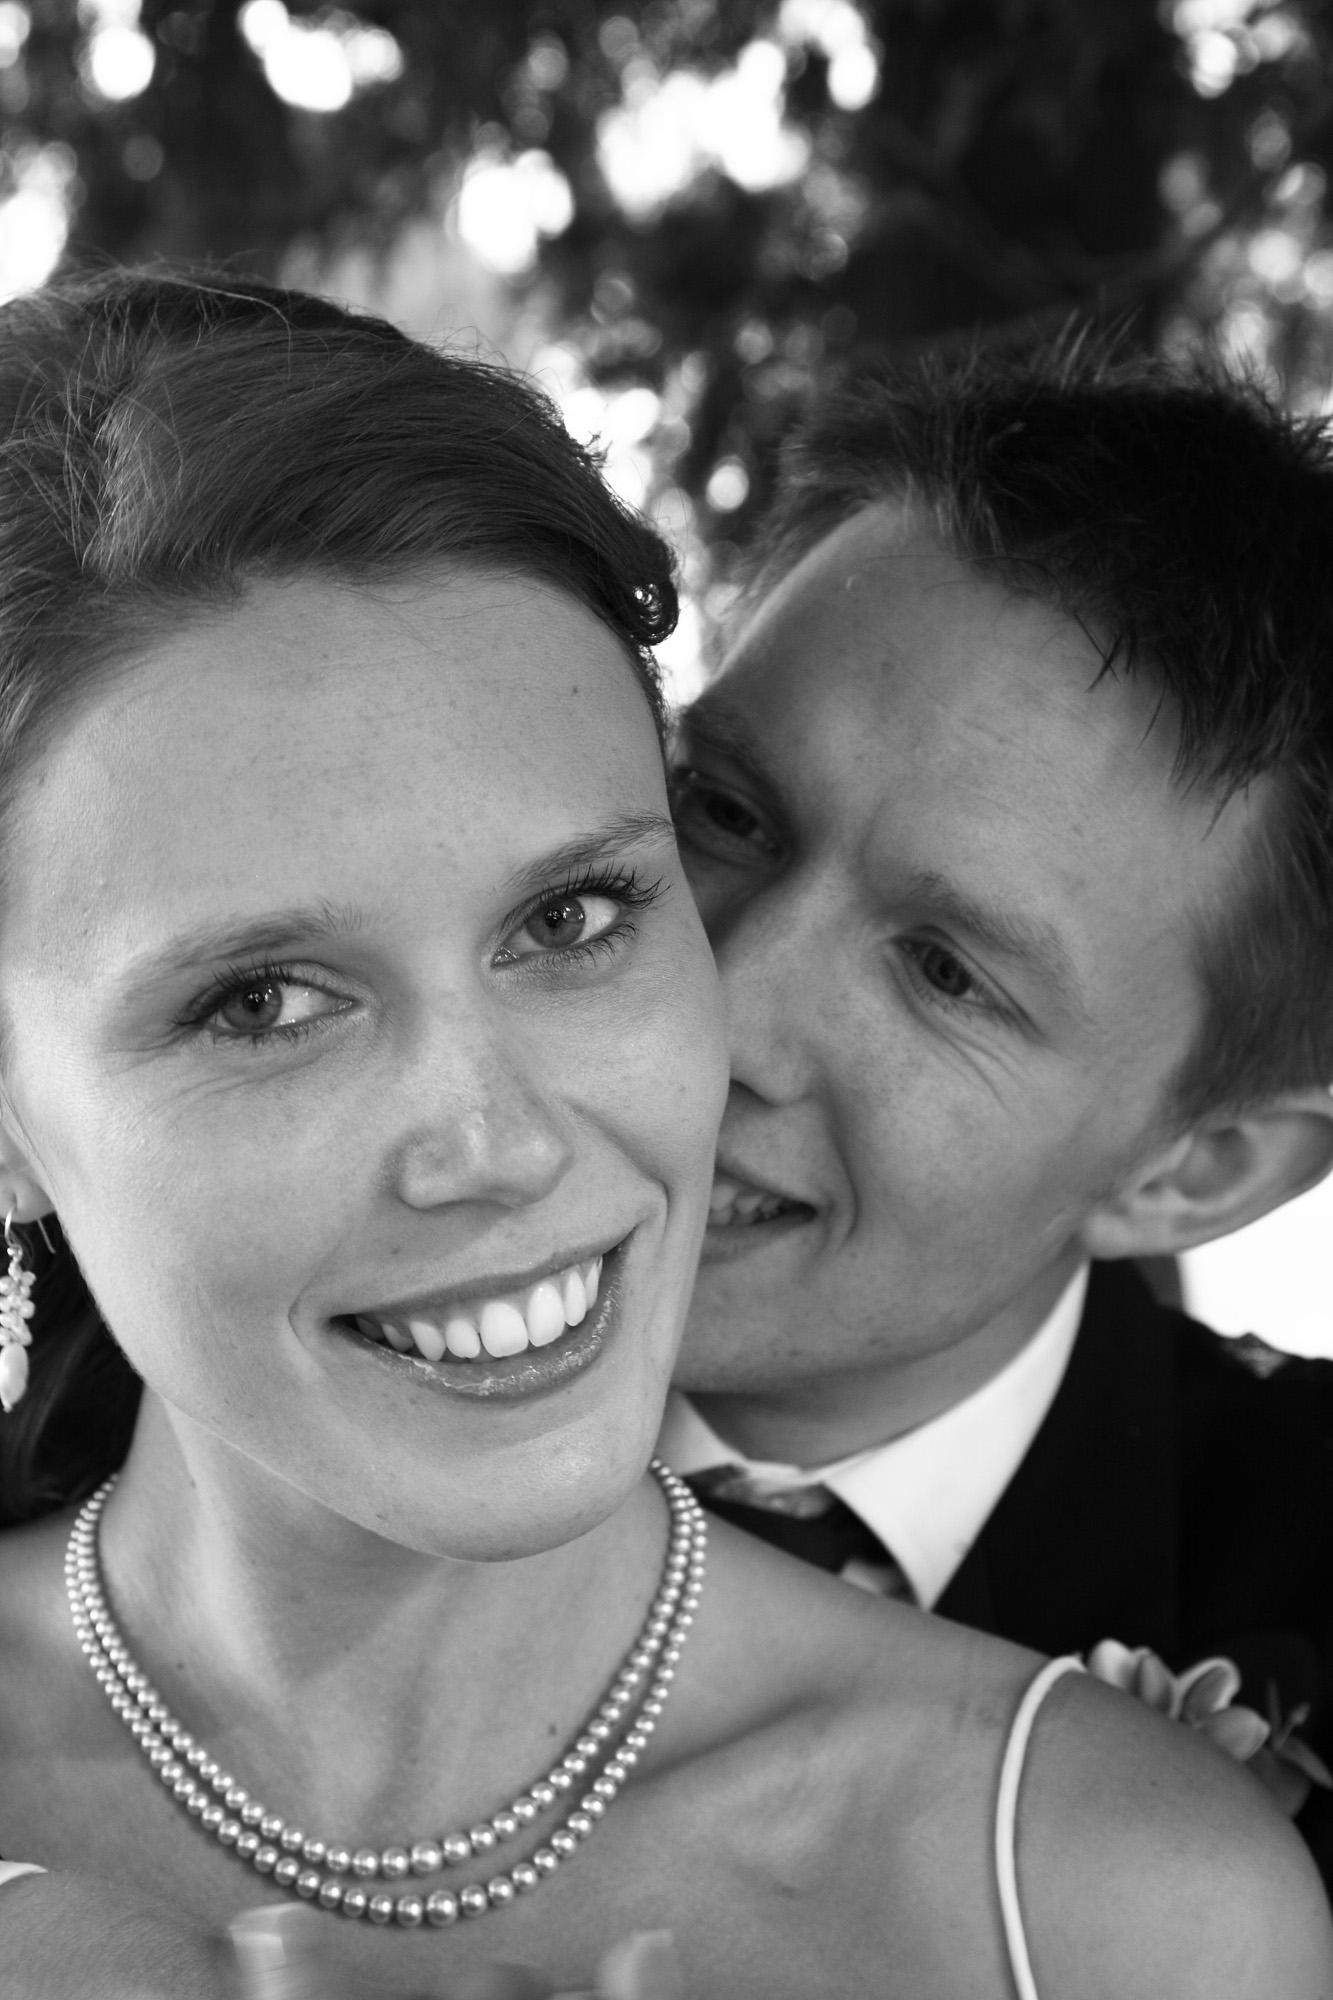 weddings-couples-love-photographer-oxford-london-jonathan-self-photography-65.jpg